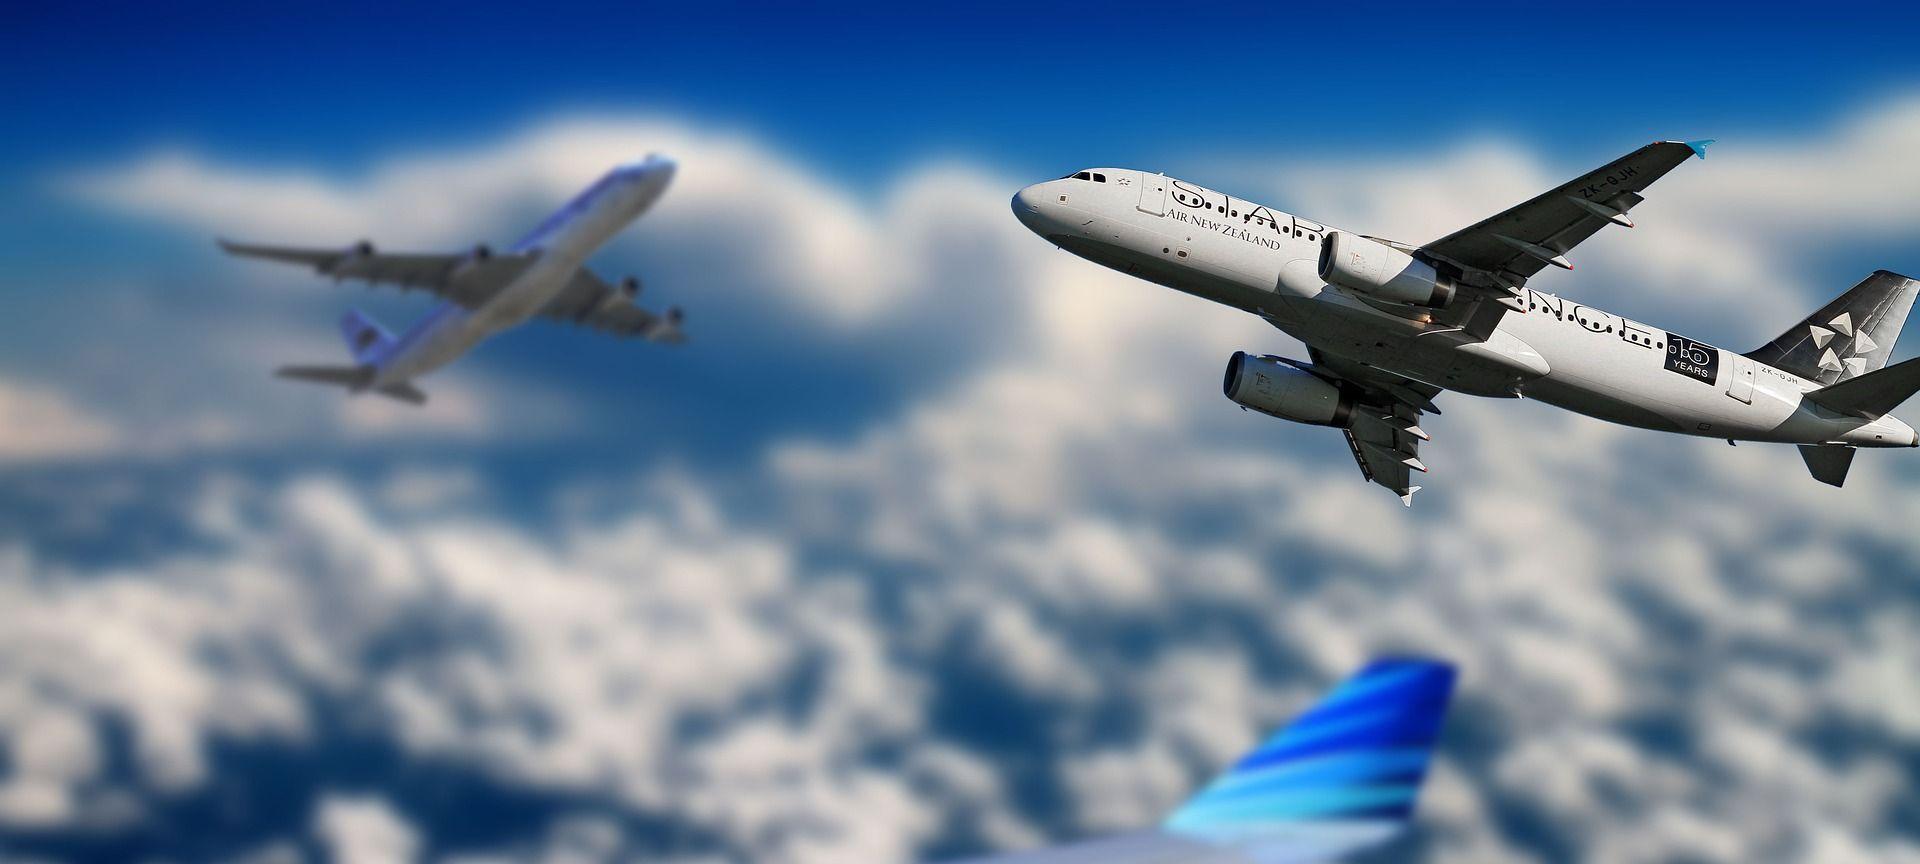 Boeing i Airbus isporučili rekordan broj civilnih zrakoplova u 2018.